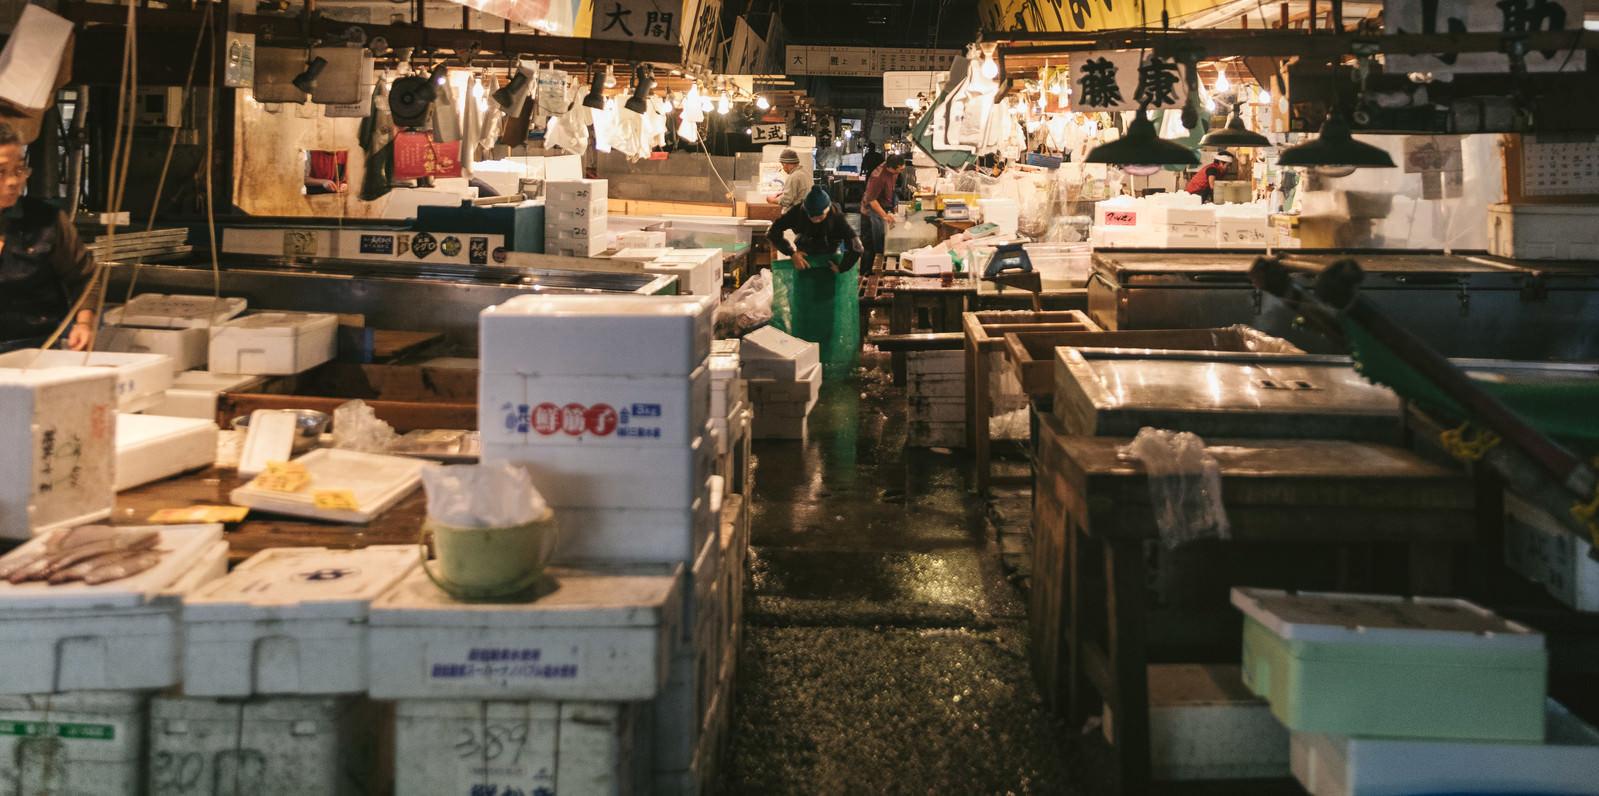 「築地市場内の水産部」の写真